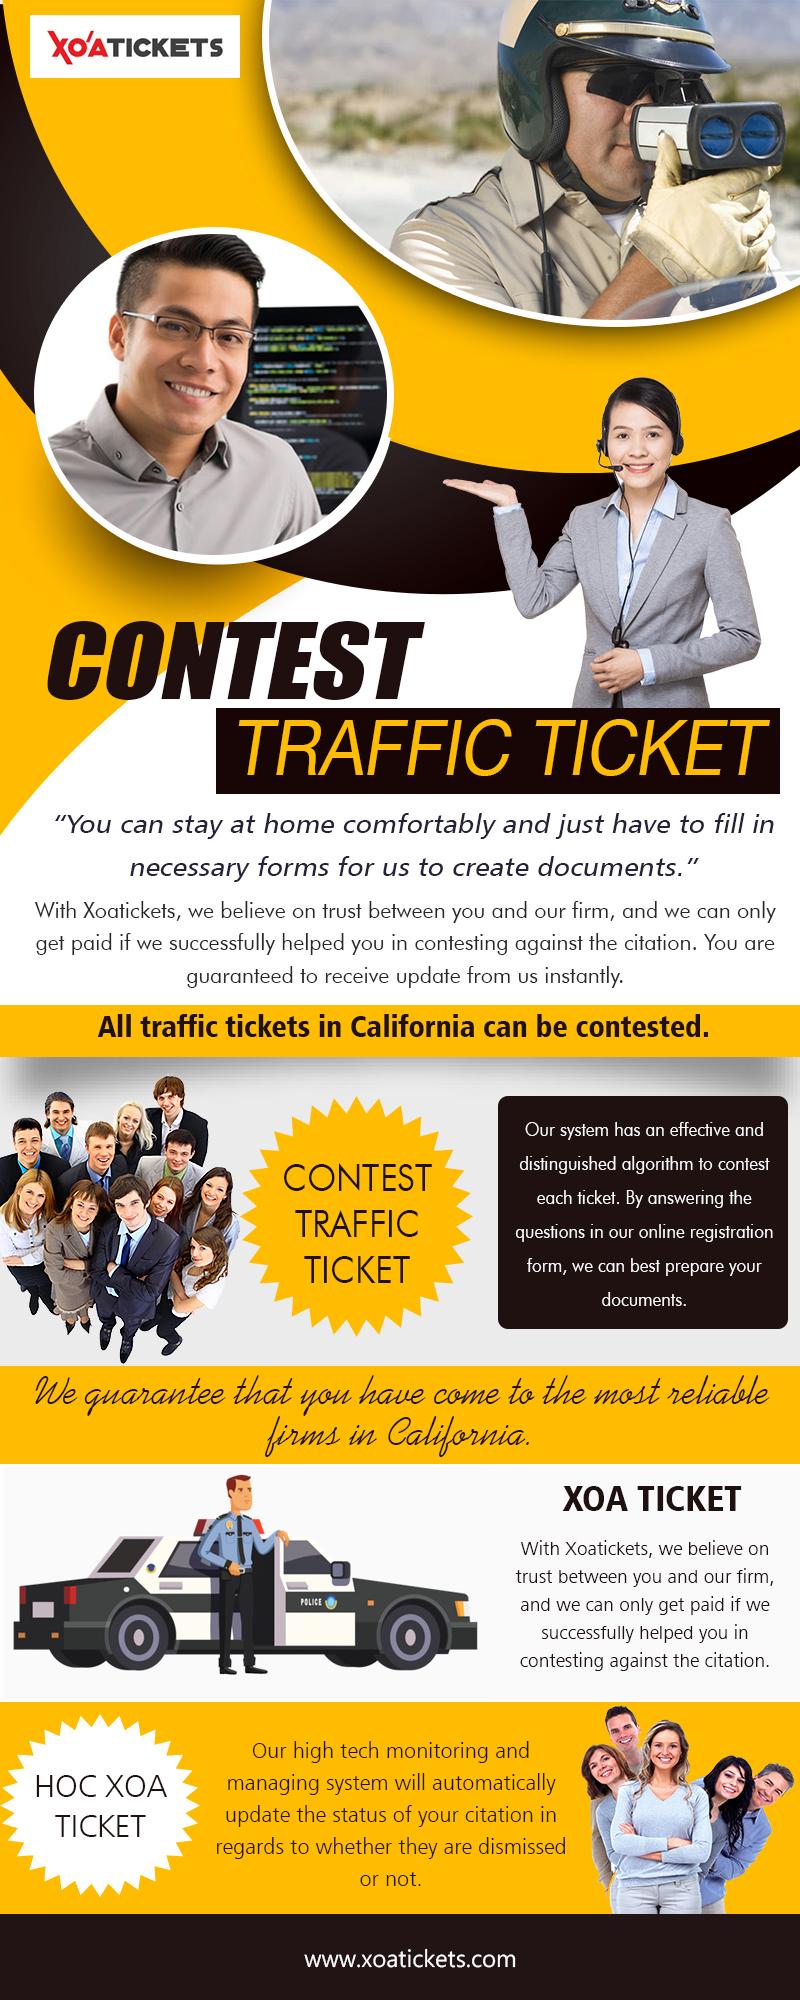 Contest Traffic Ticket